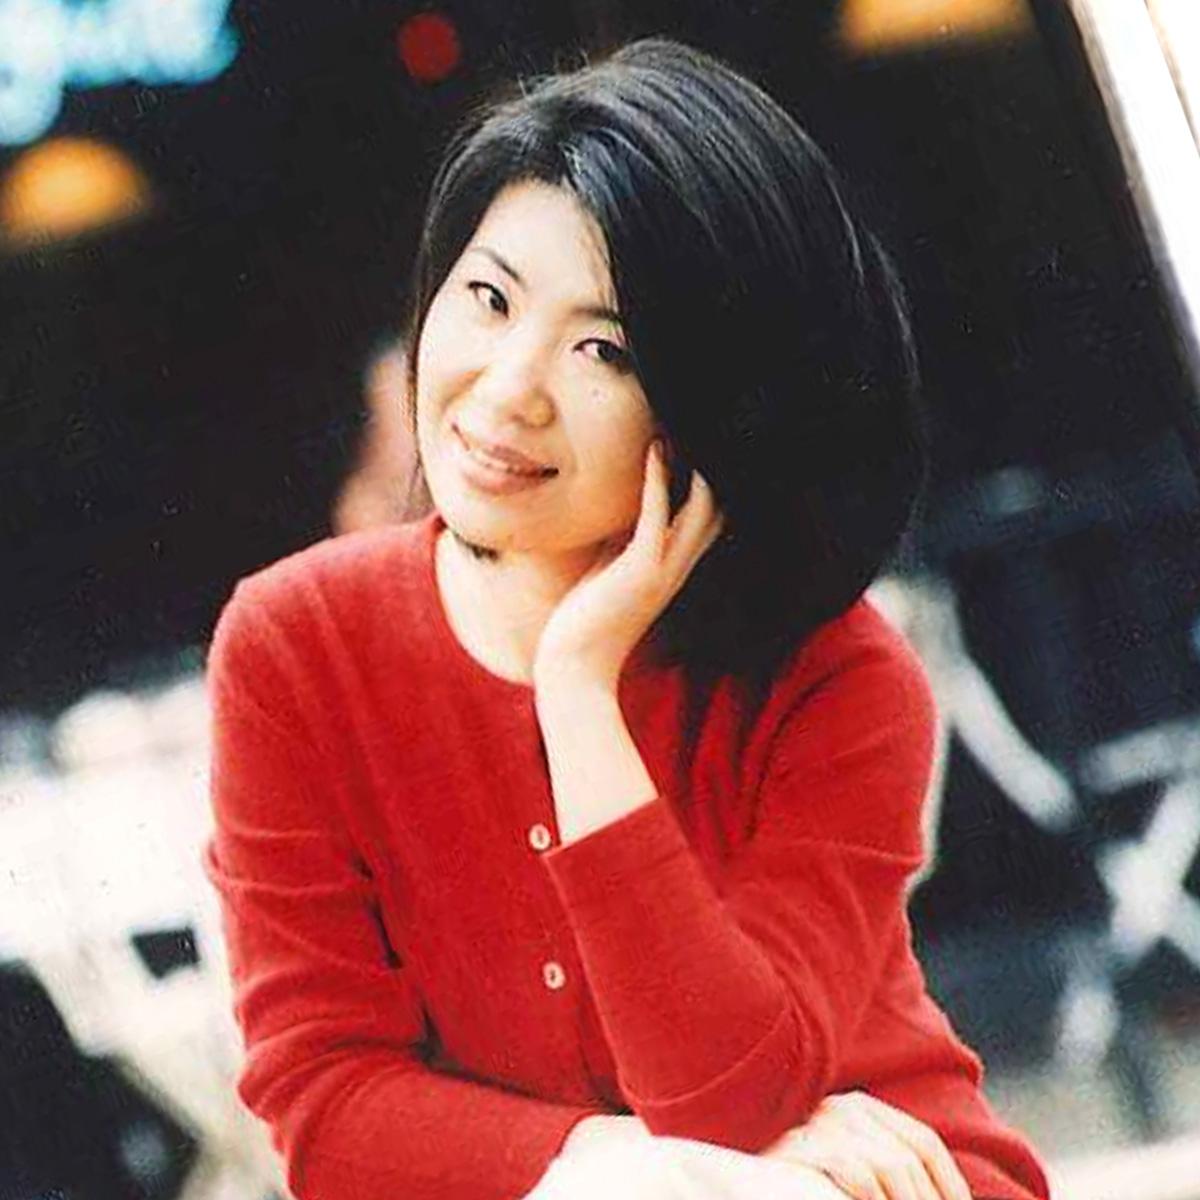 Hyun Joo Chung